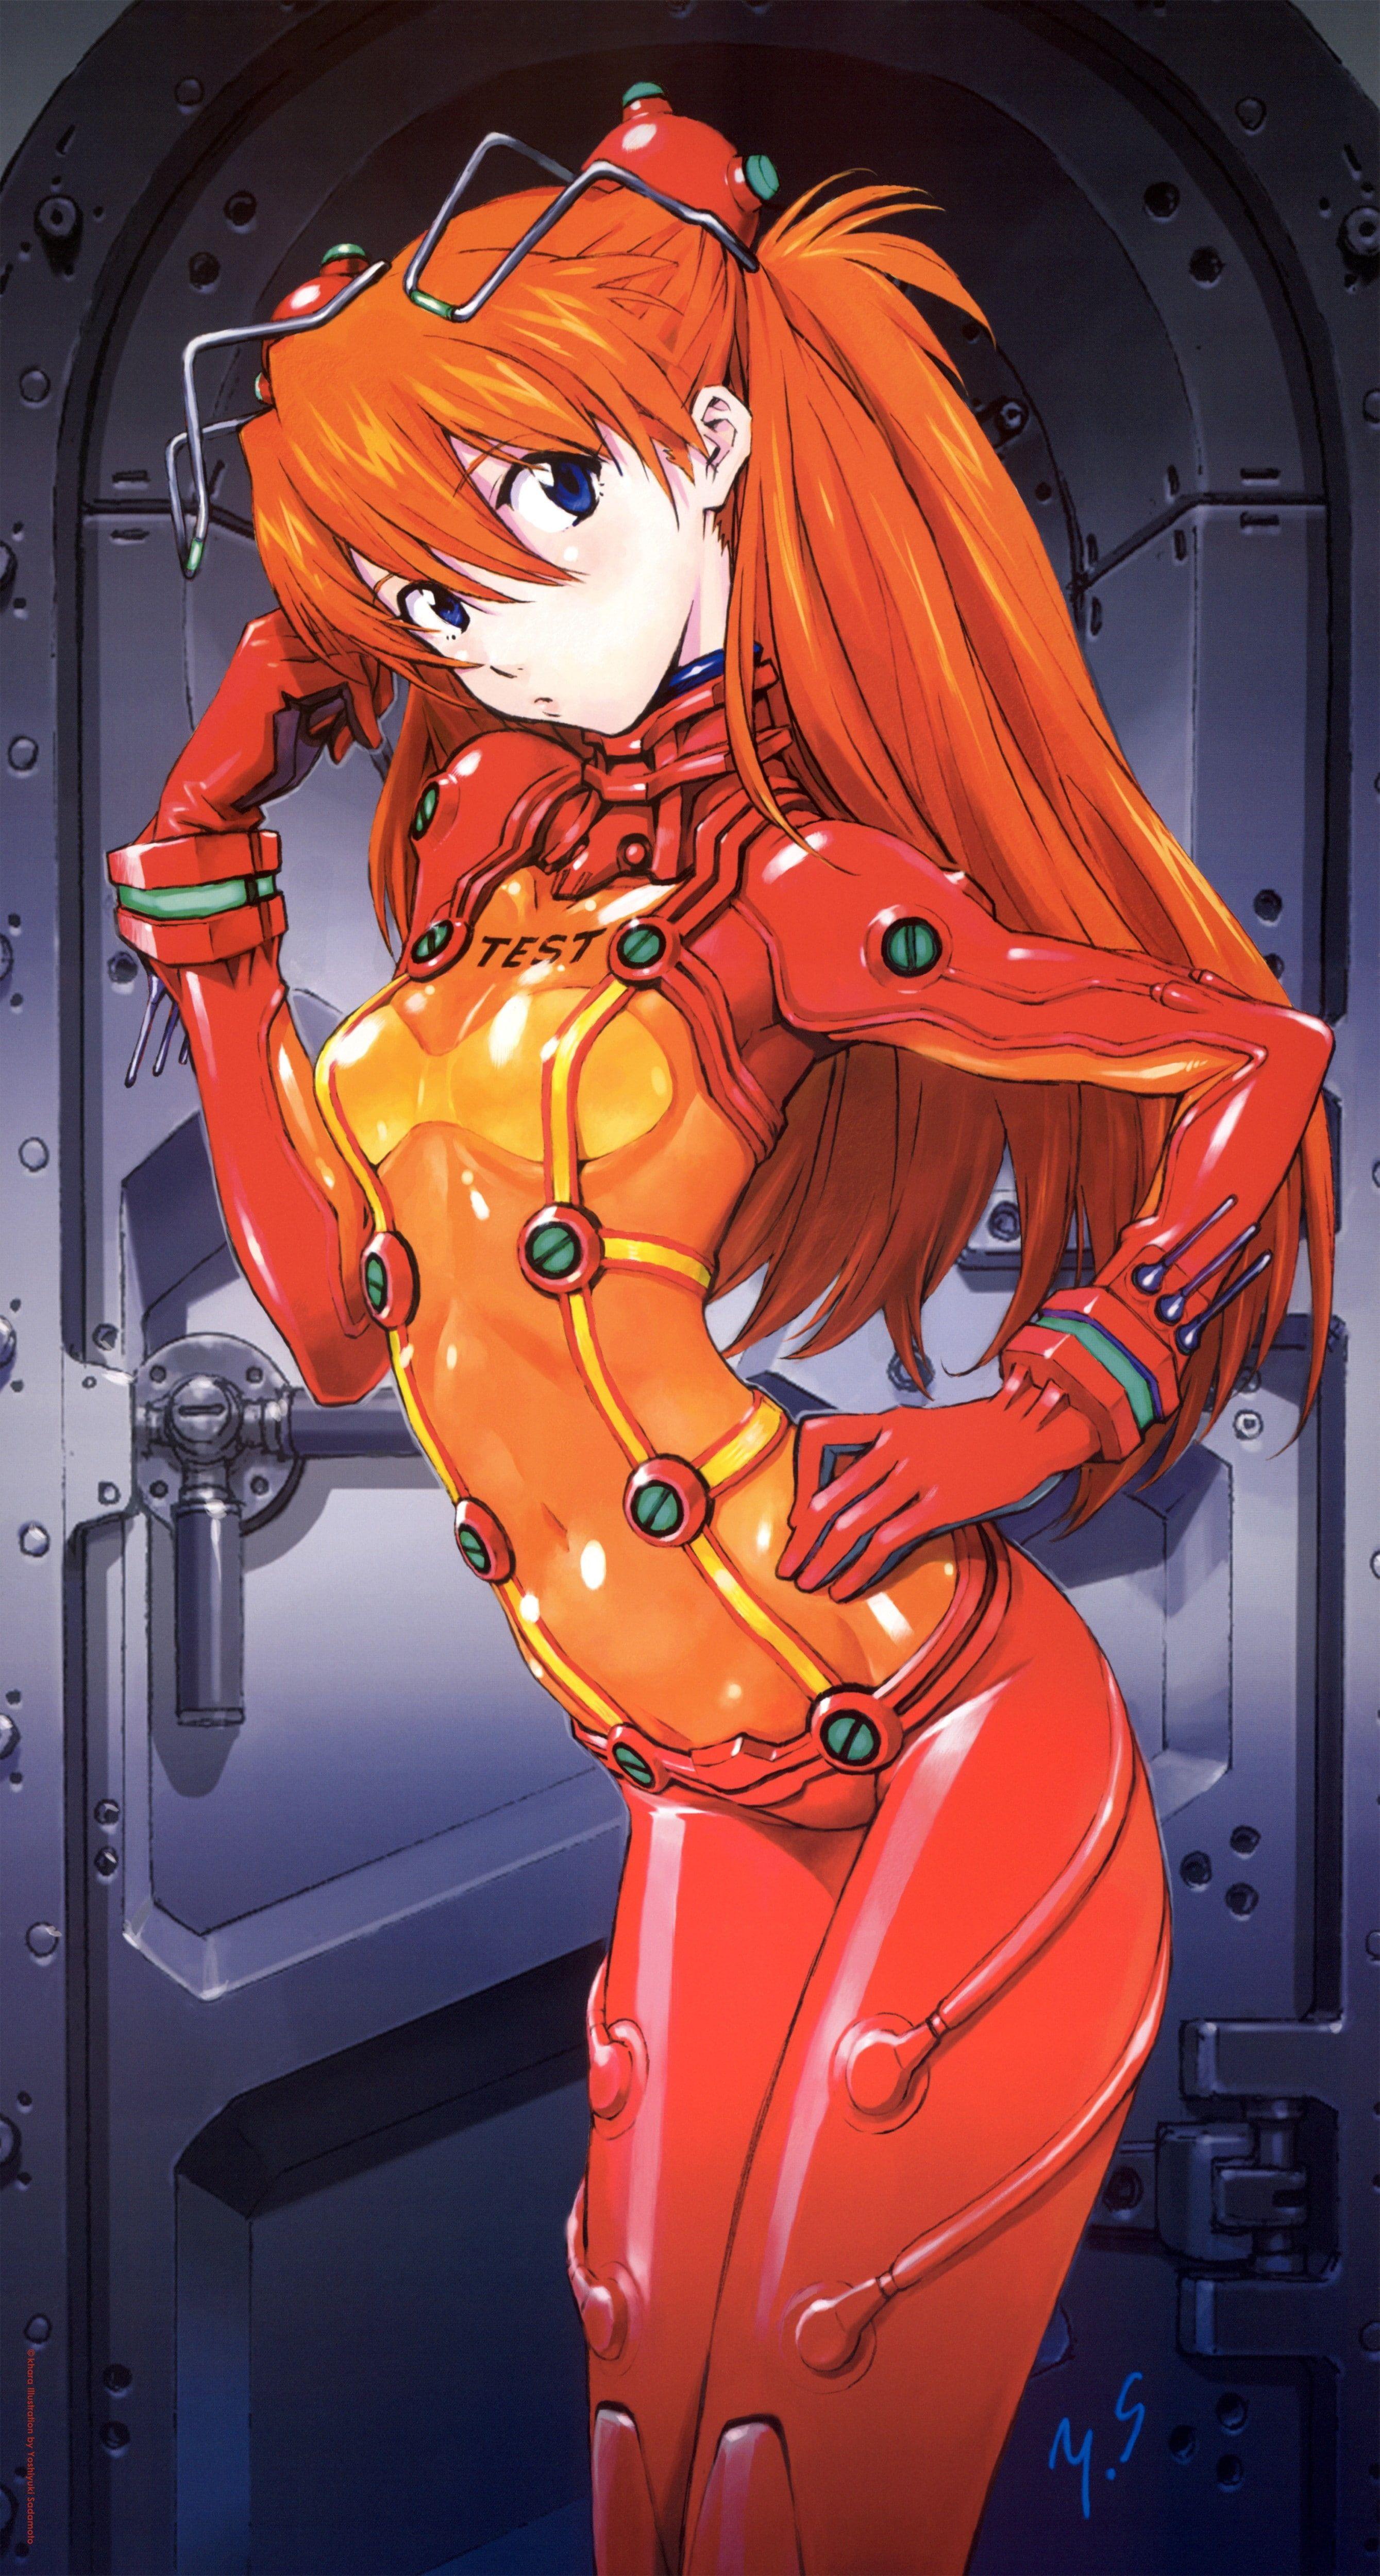 Neon Genesis Evangelion Asuka Langley Soryu 2678x5000 Anime